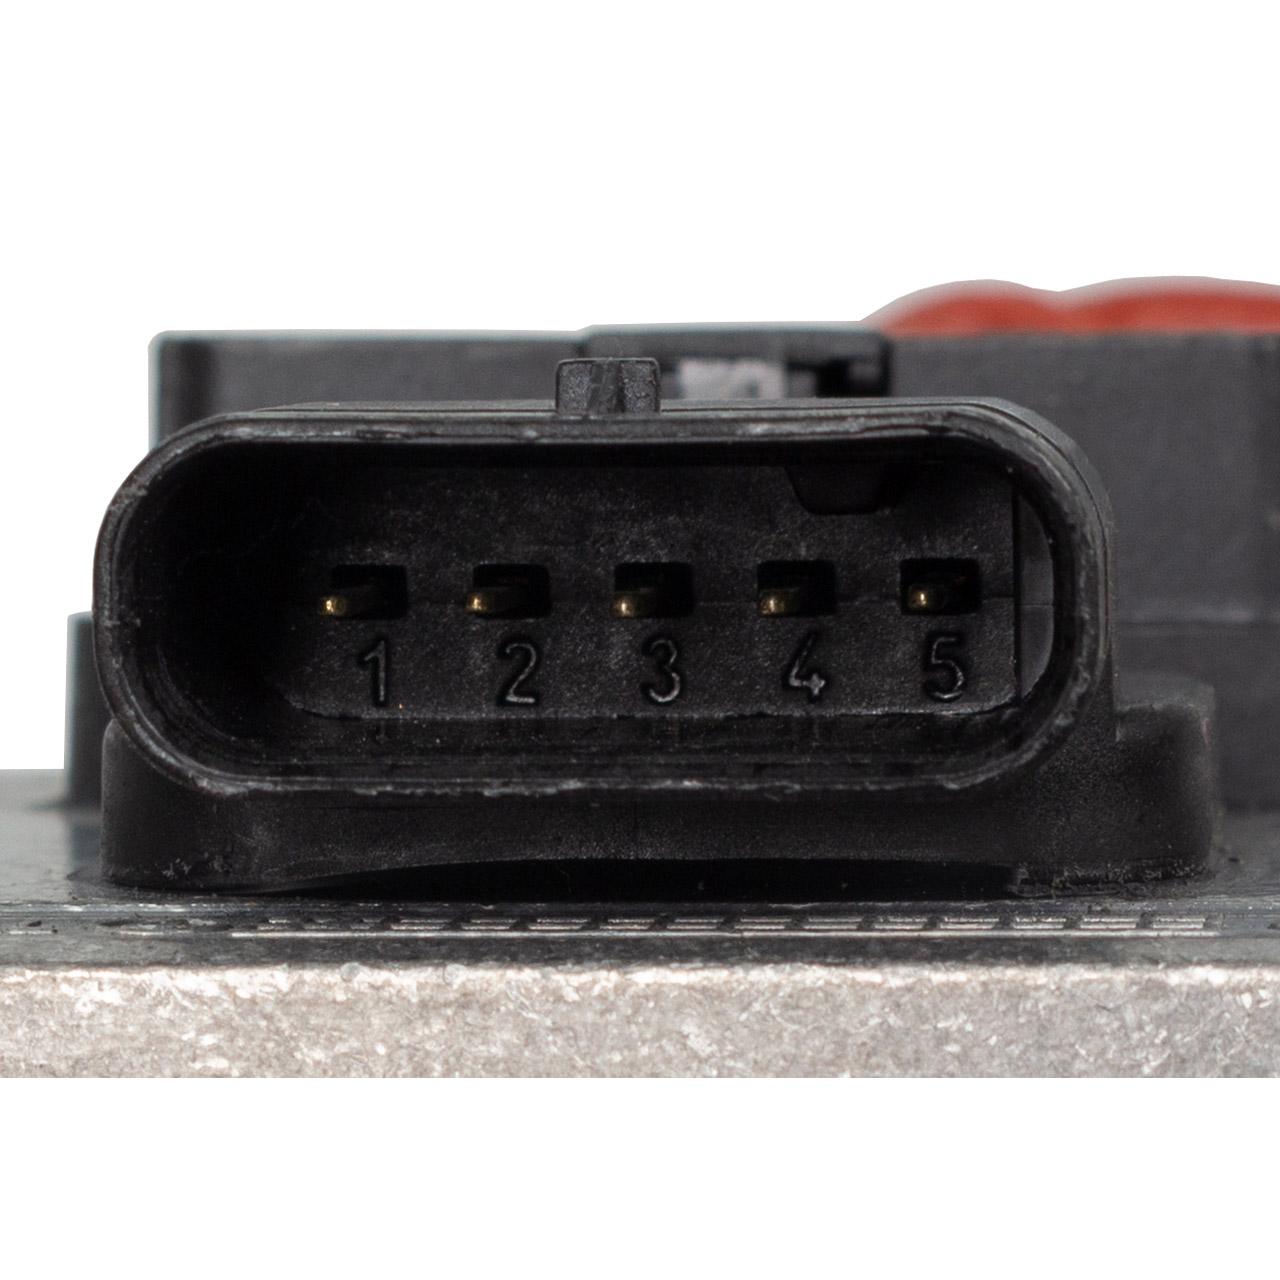 Lambdasonde NOx-Sensor NOx-Sonde Kat Katalysator BMW F20/21 F22/23 E90 F10/11/07 F01 X5 X6